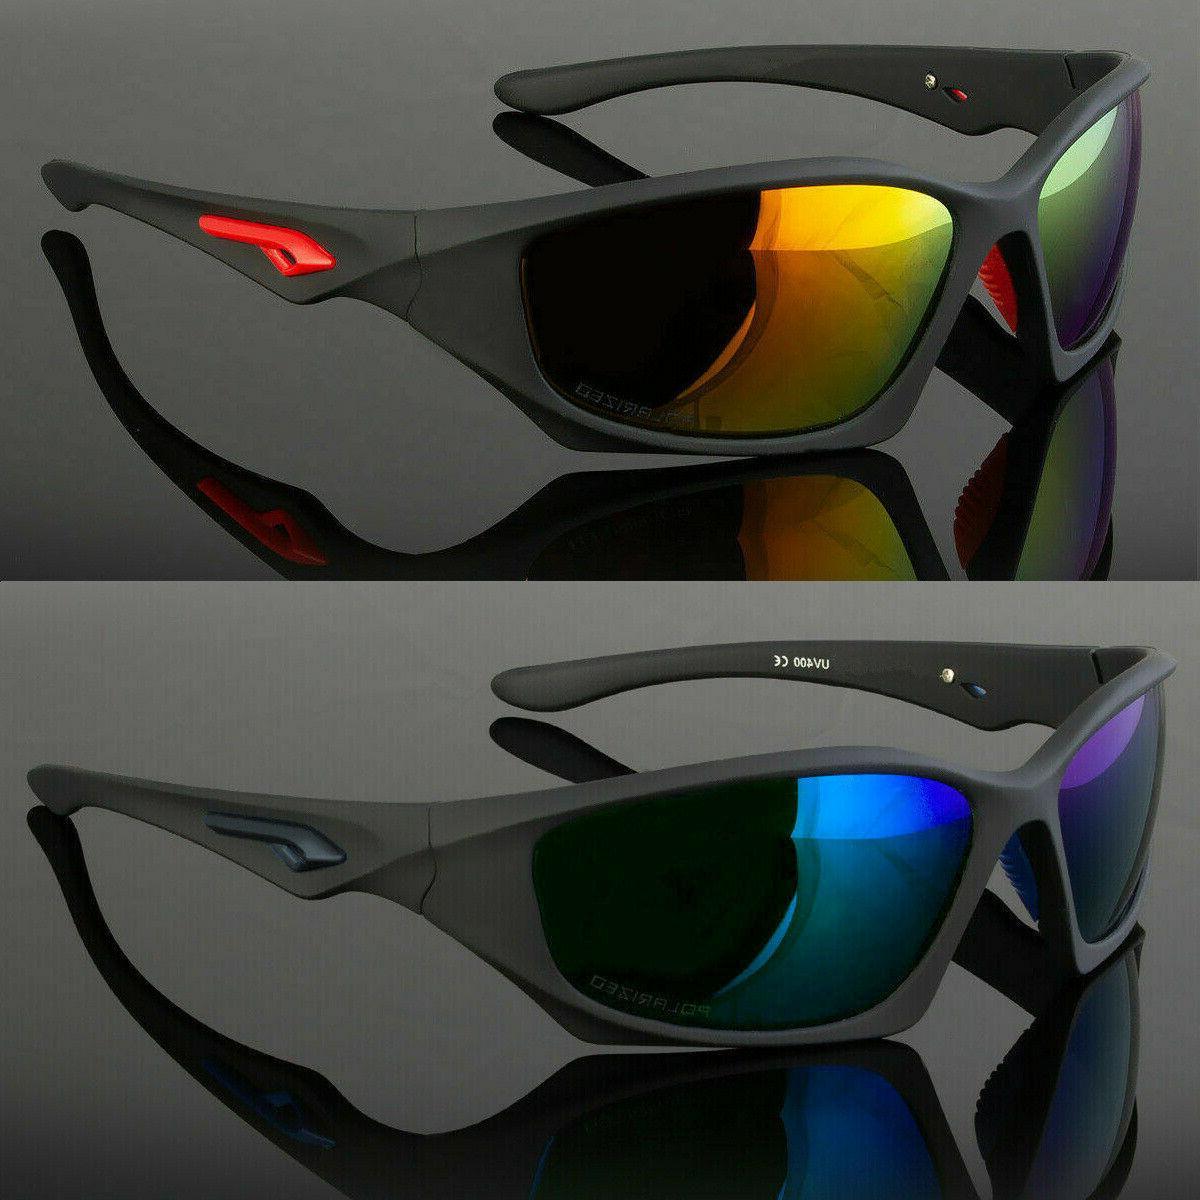 new polarized outdoor sports eyewear driving sunglasses